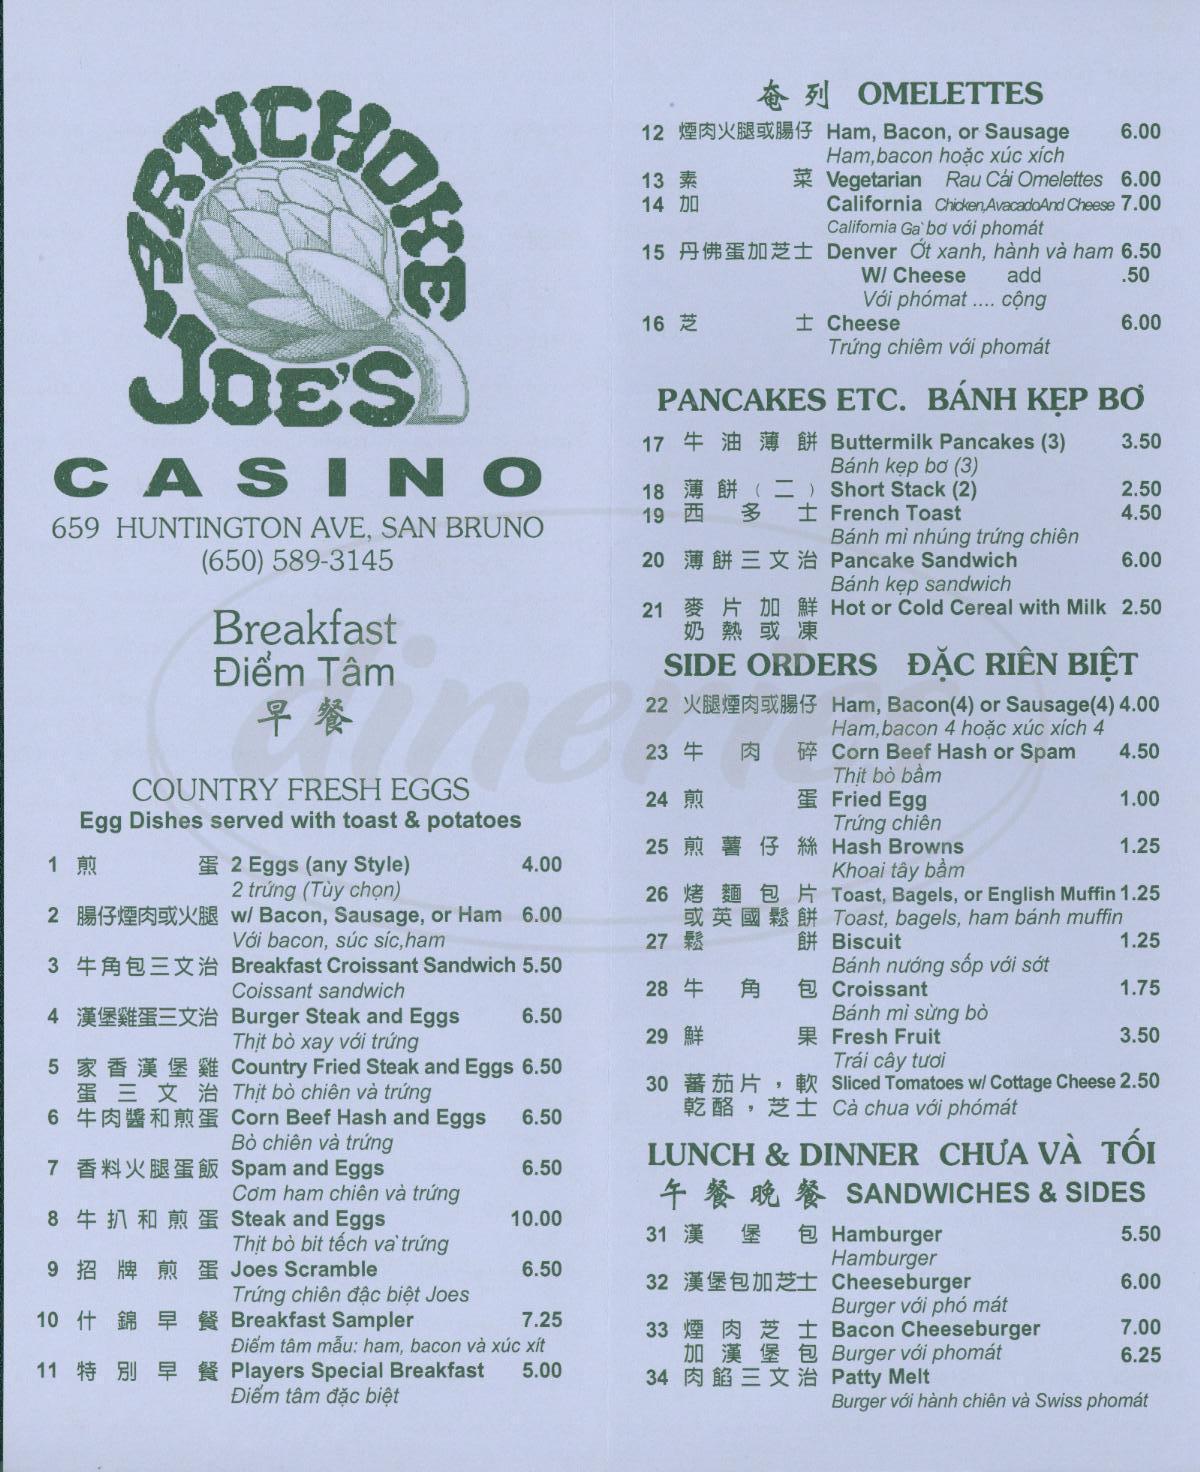 menu for Artichoke Joe's